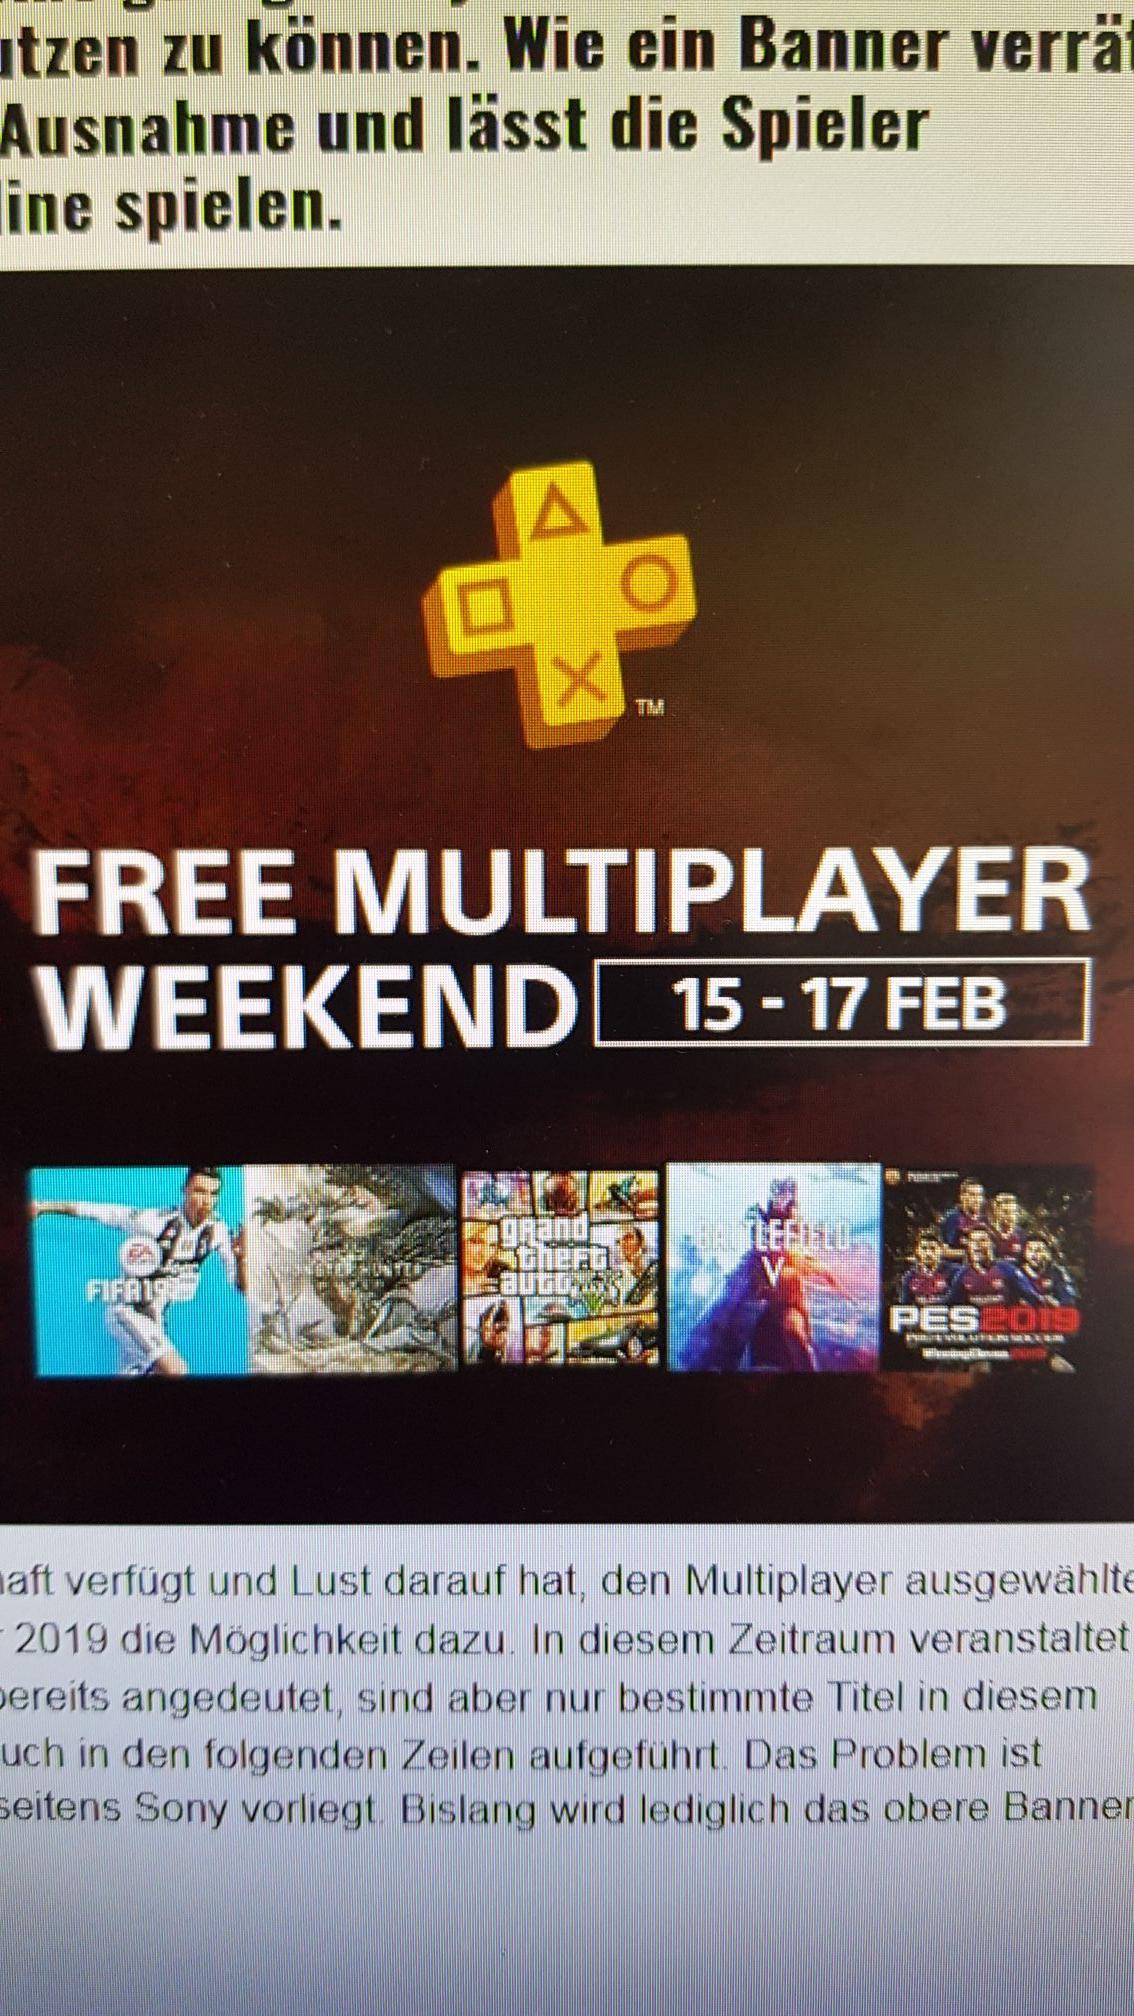 Playstation Plus Free Multiplayer Weekend z.B Red Dead Online